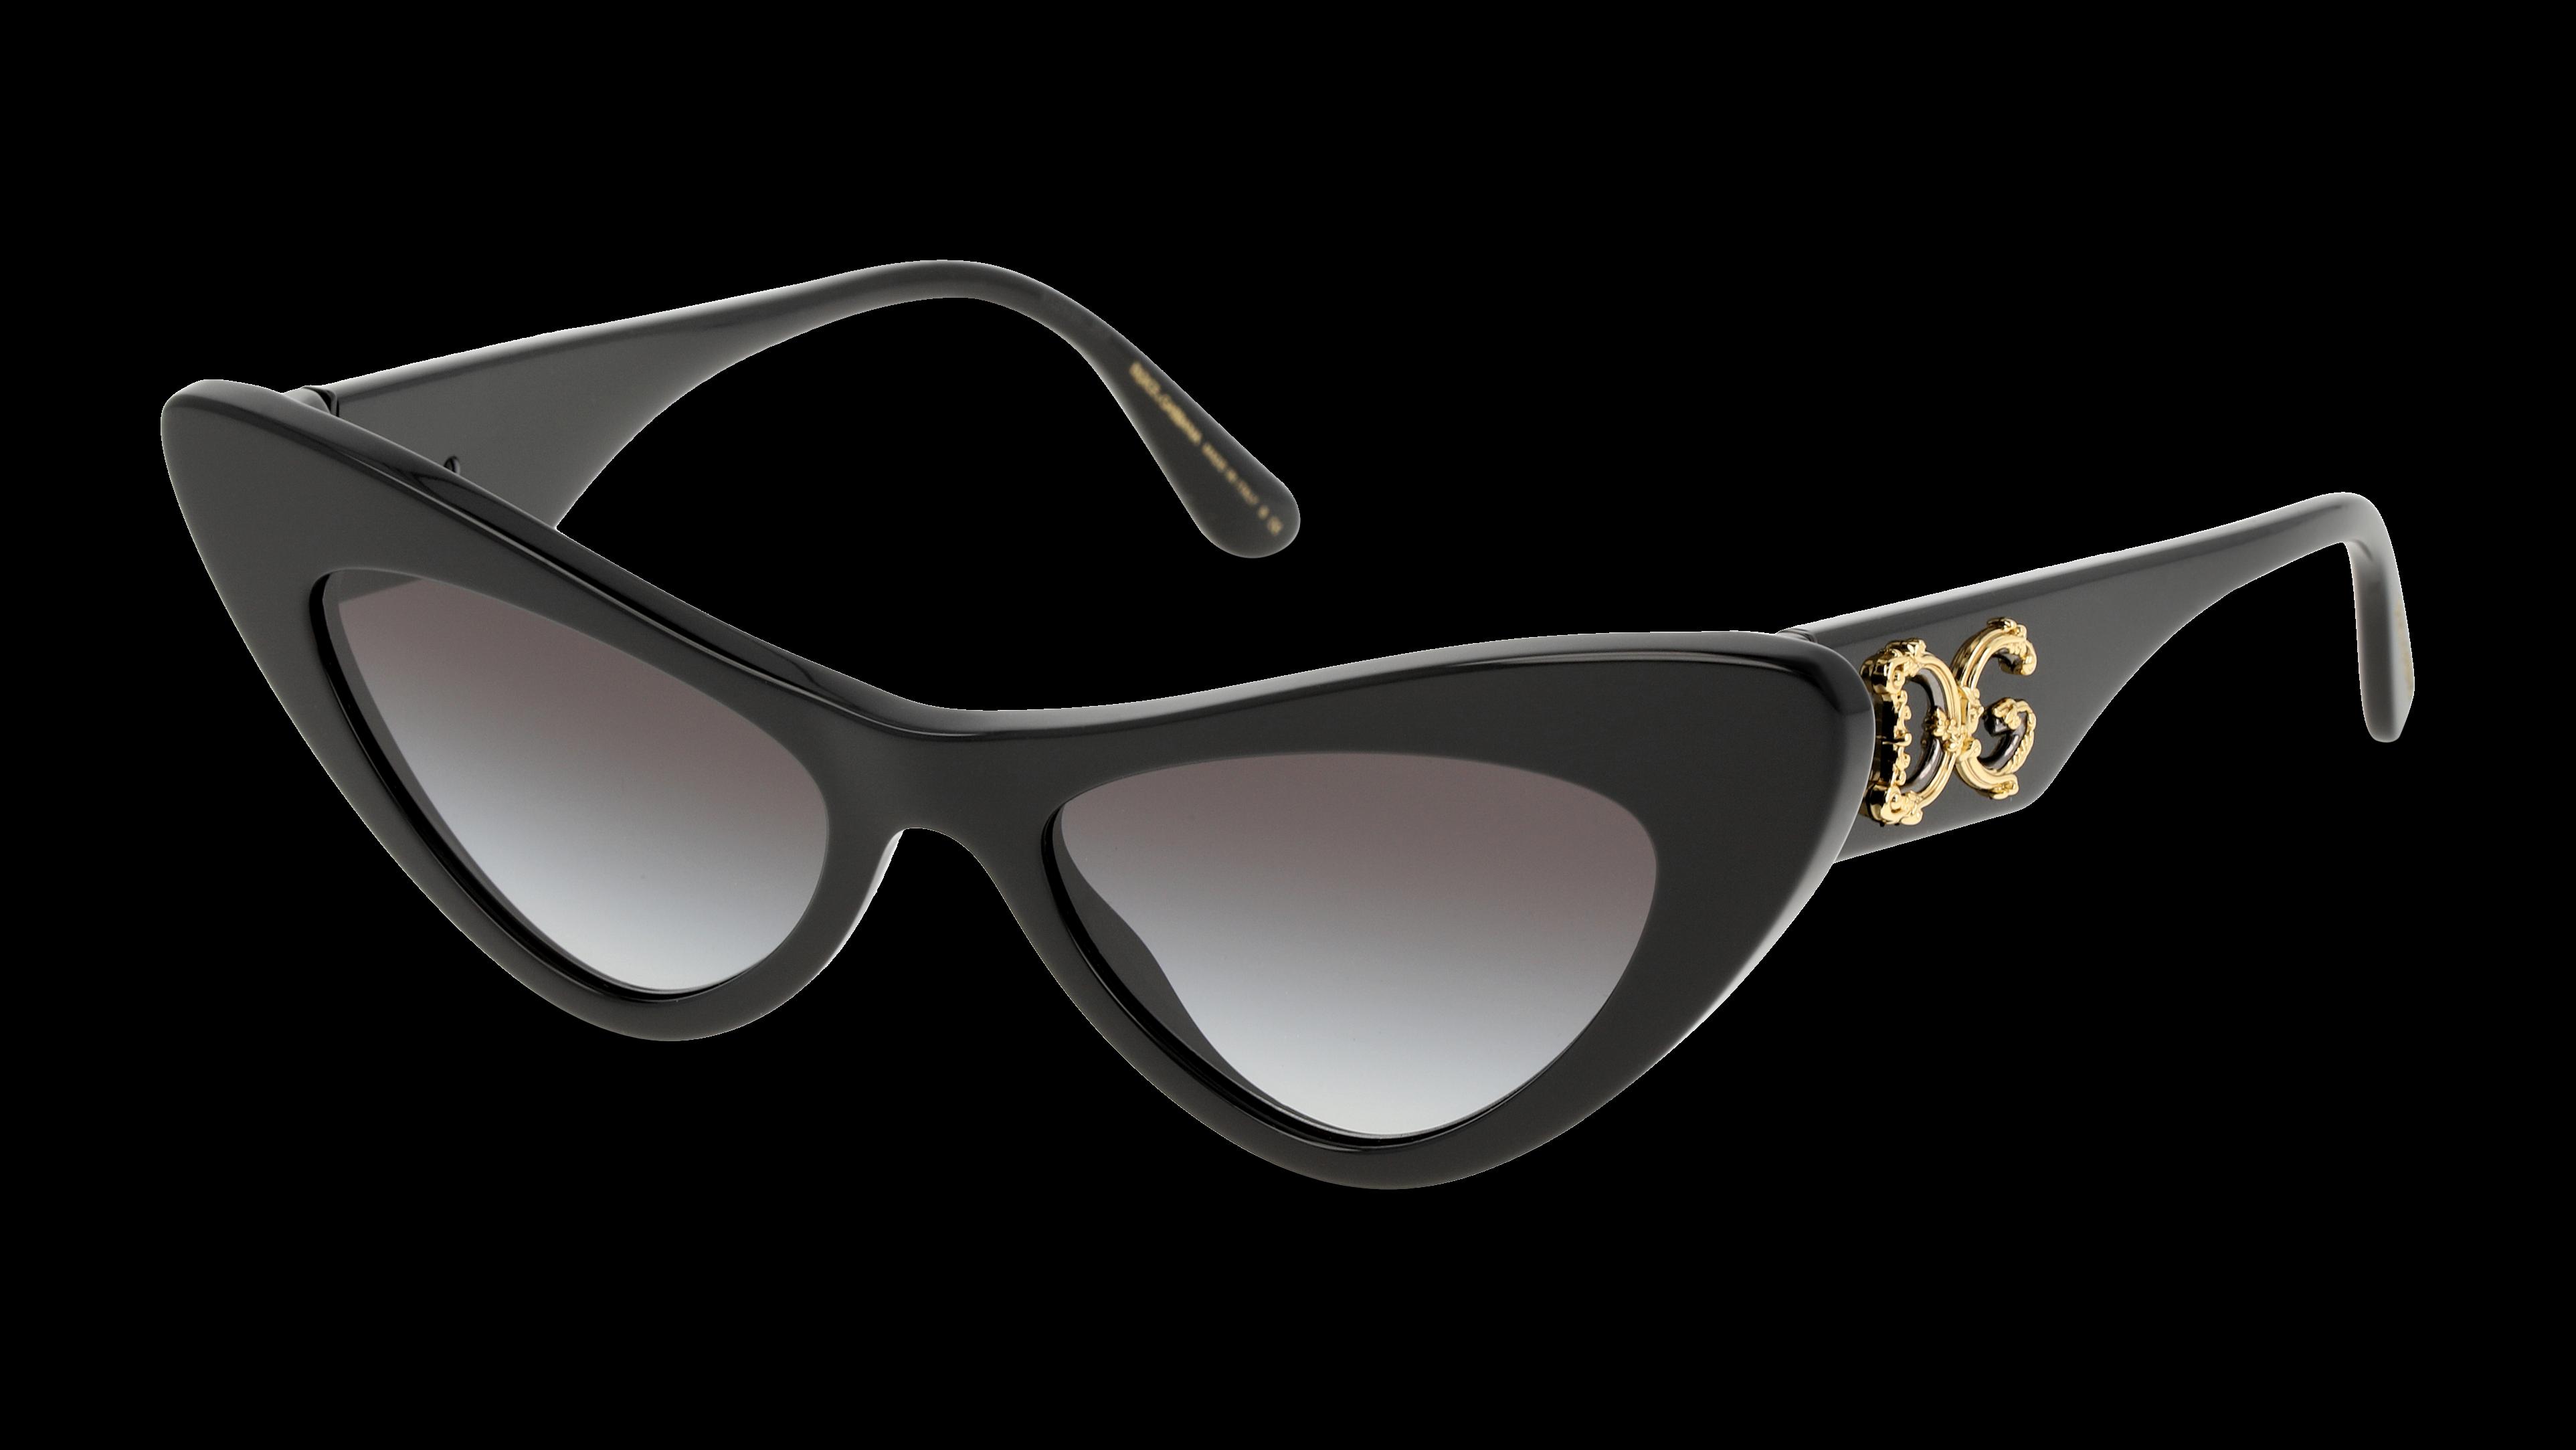 Angle_Left01 Dolce & Gabbana DolceGab 4368 52 323113 Marrone/Rosa